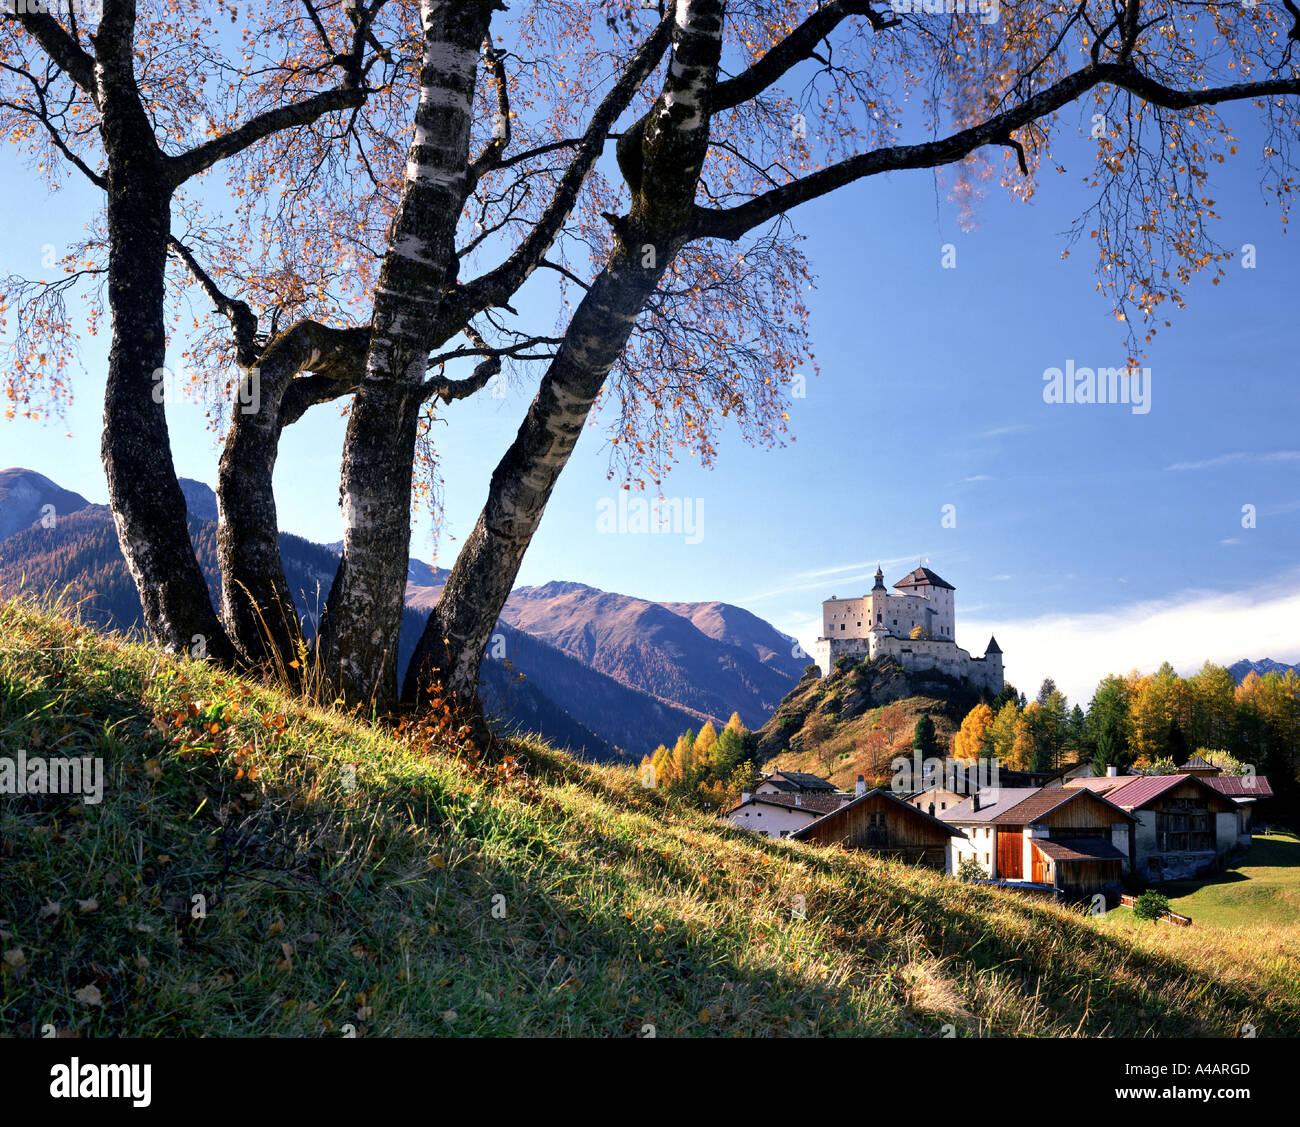 CH - UNTERENGADIN: Schloss Tarasp Stockbild